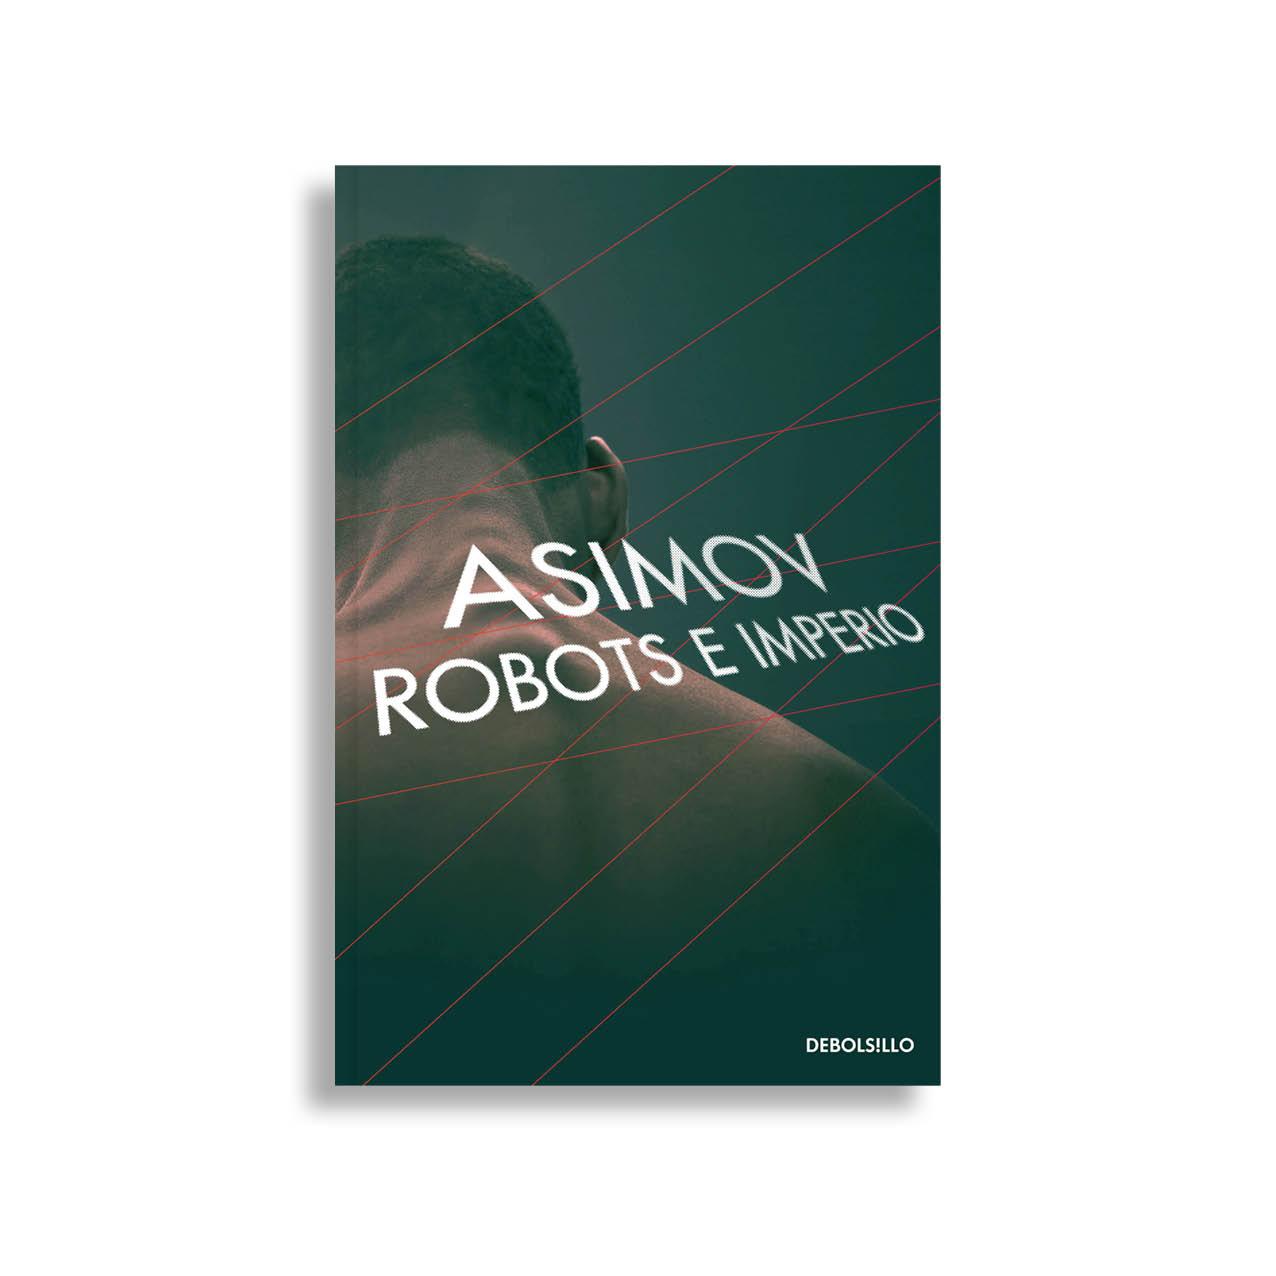 DB - Asimov 4